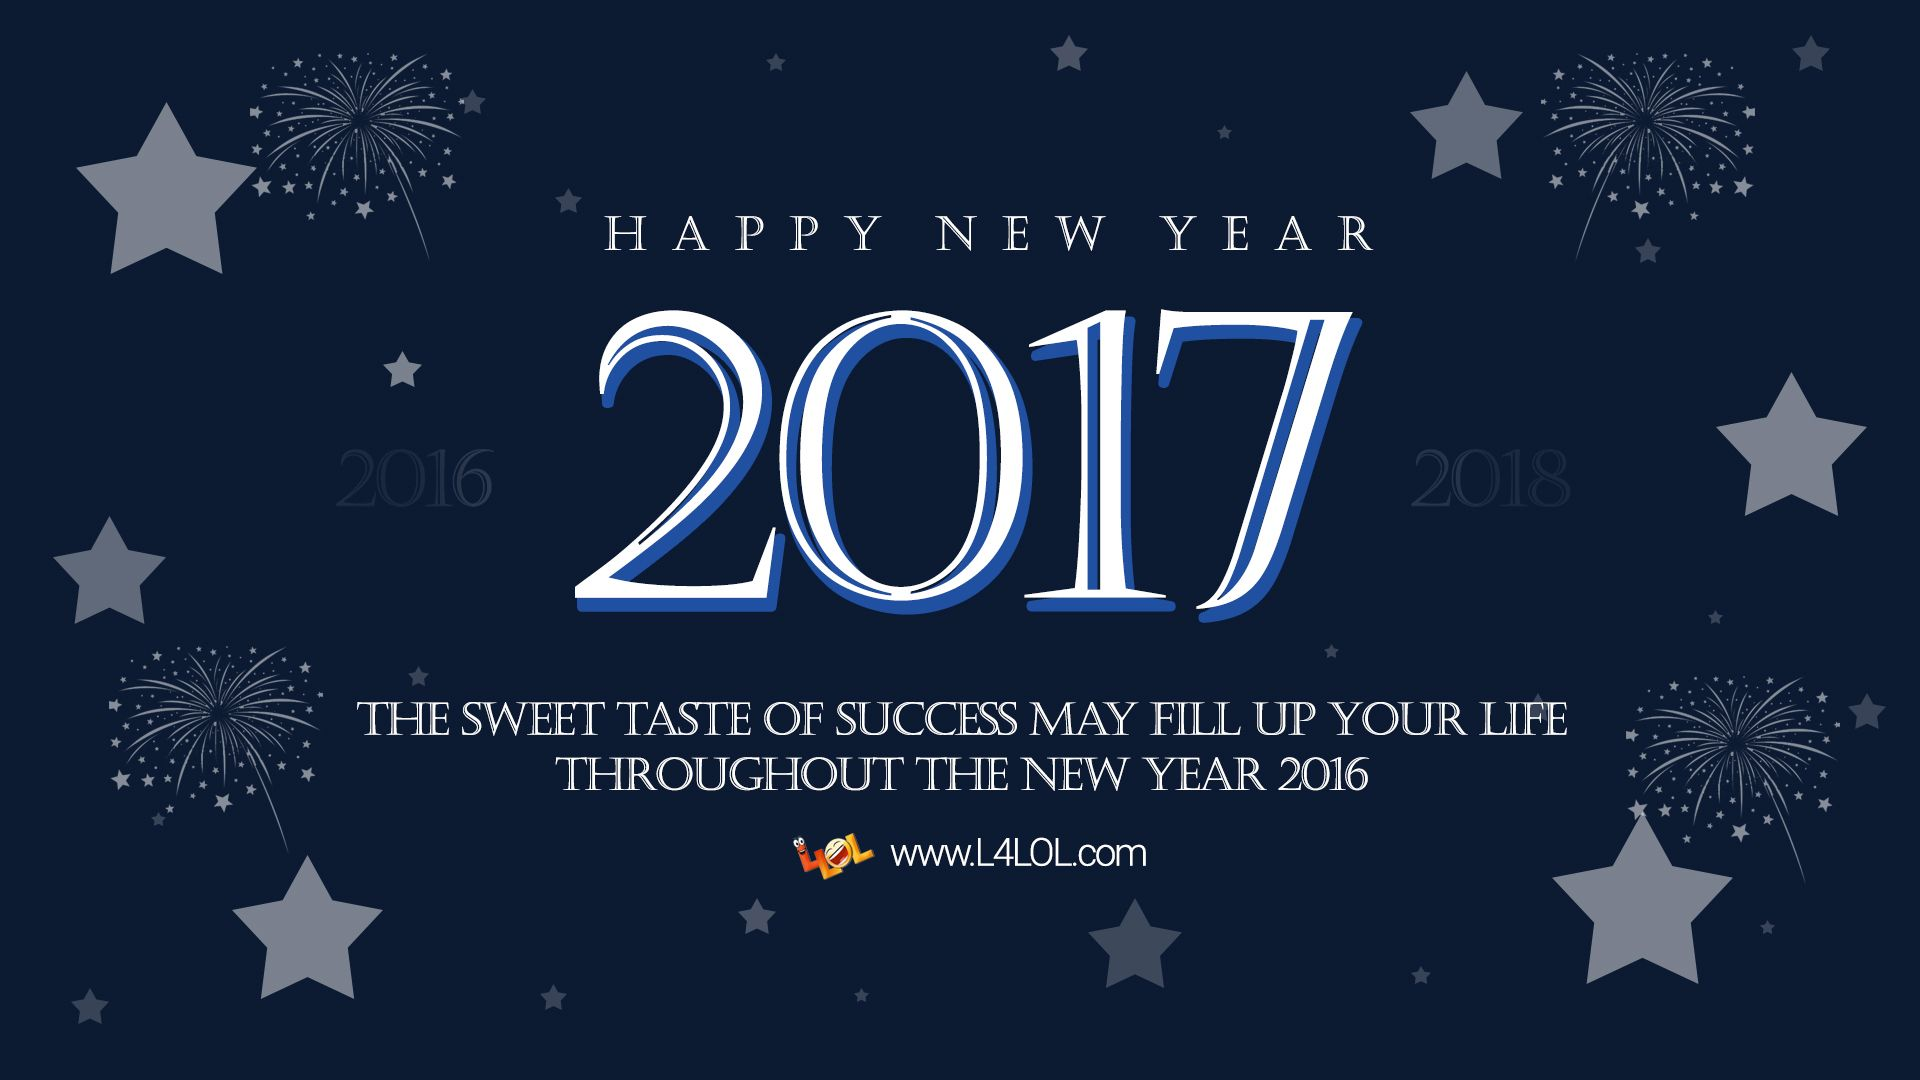 Hd wallpaper latest 2017 - Happy New Year 2017 Wallpapers Http Www Welcomehappynewyear2016 Com